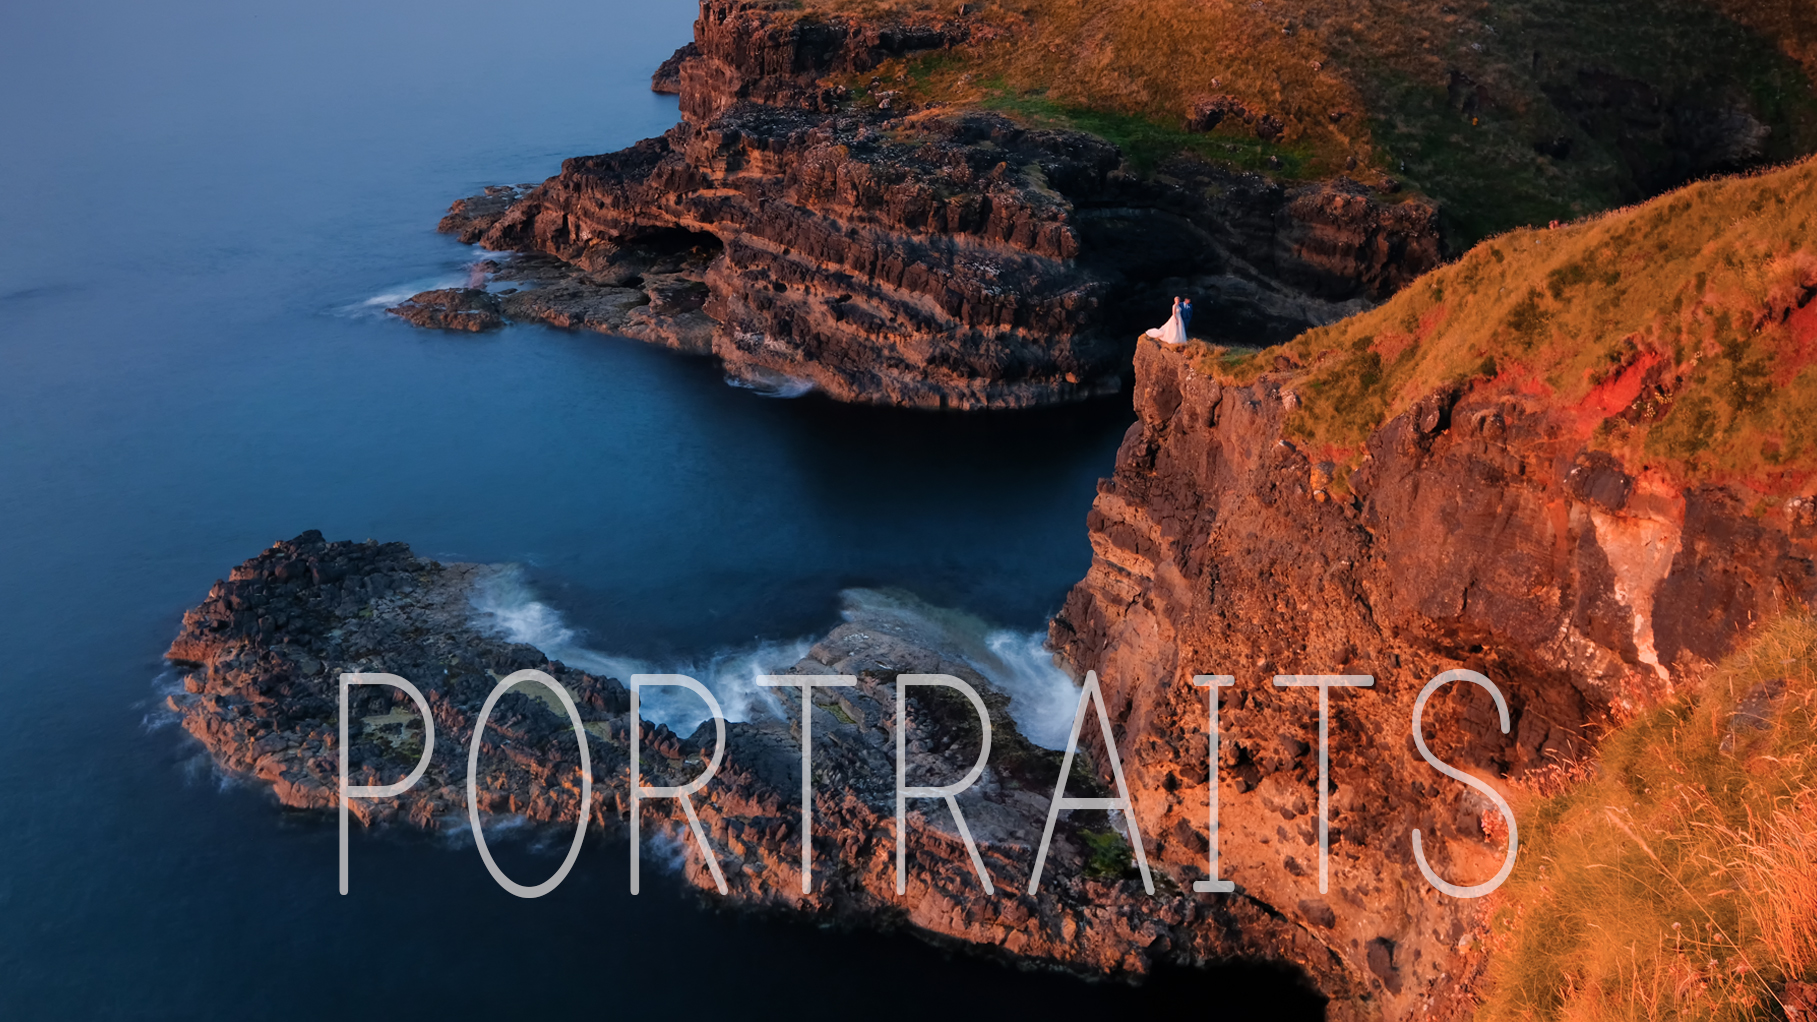 Portraits Web home page banners.jpg